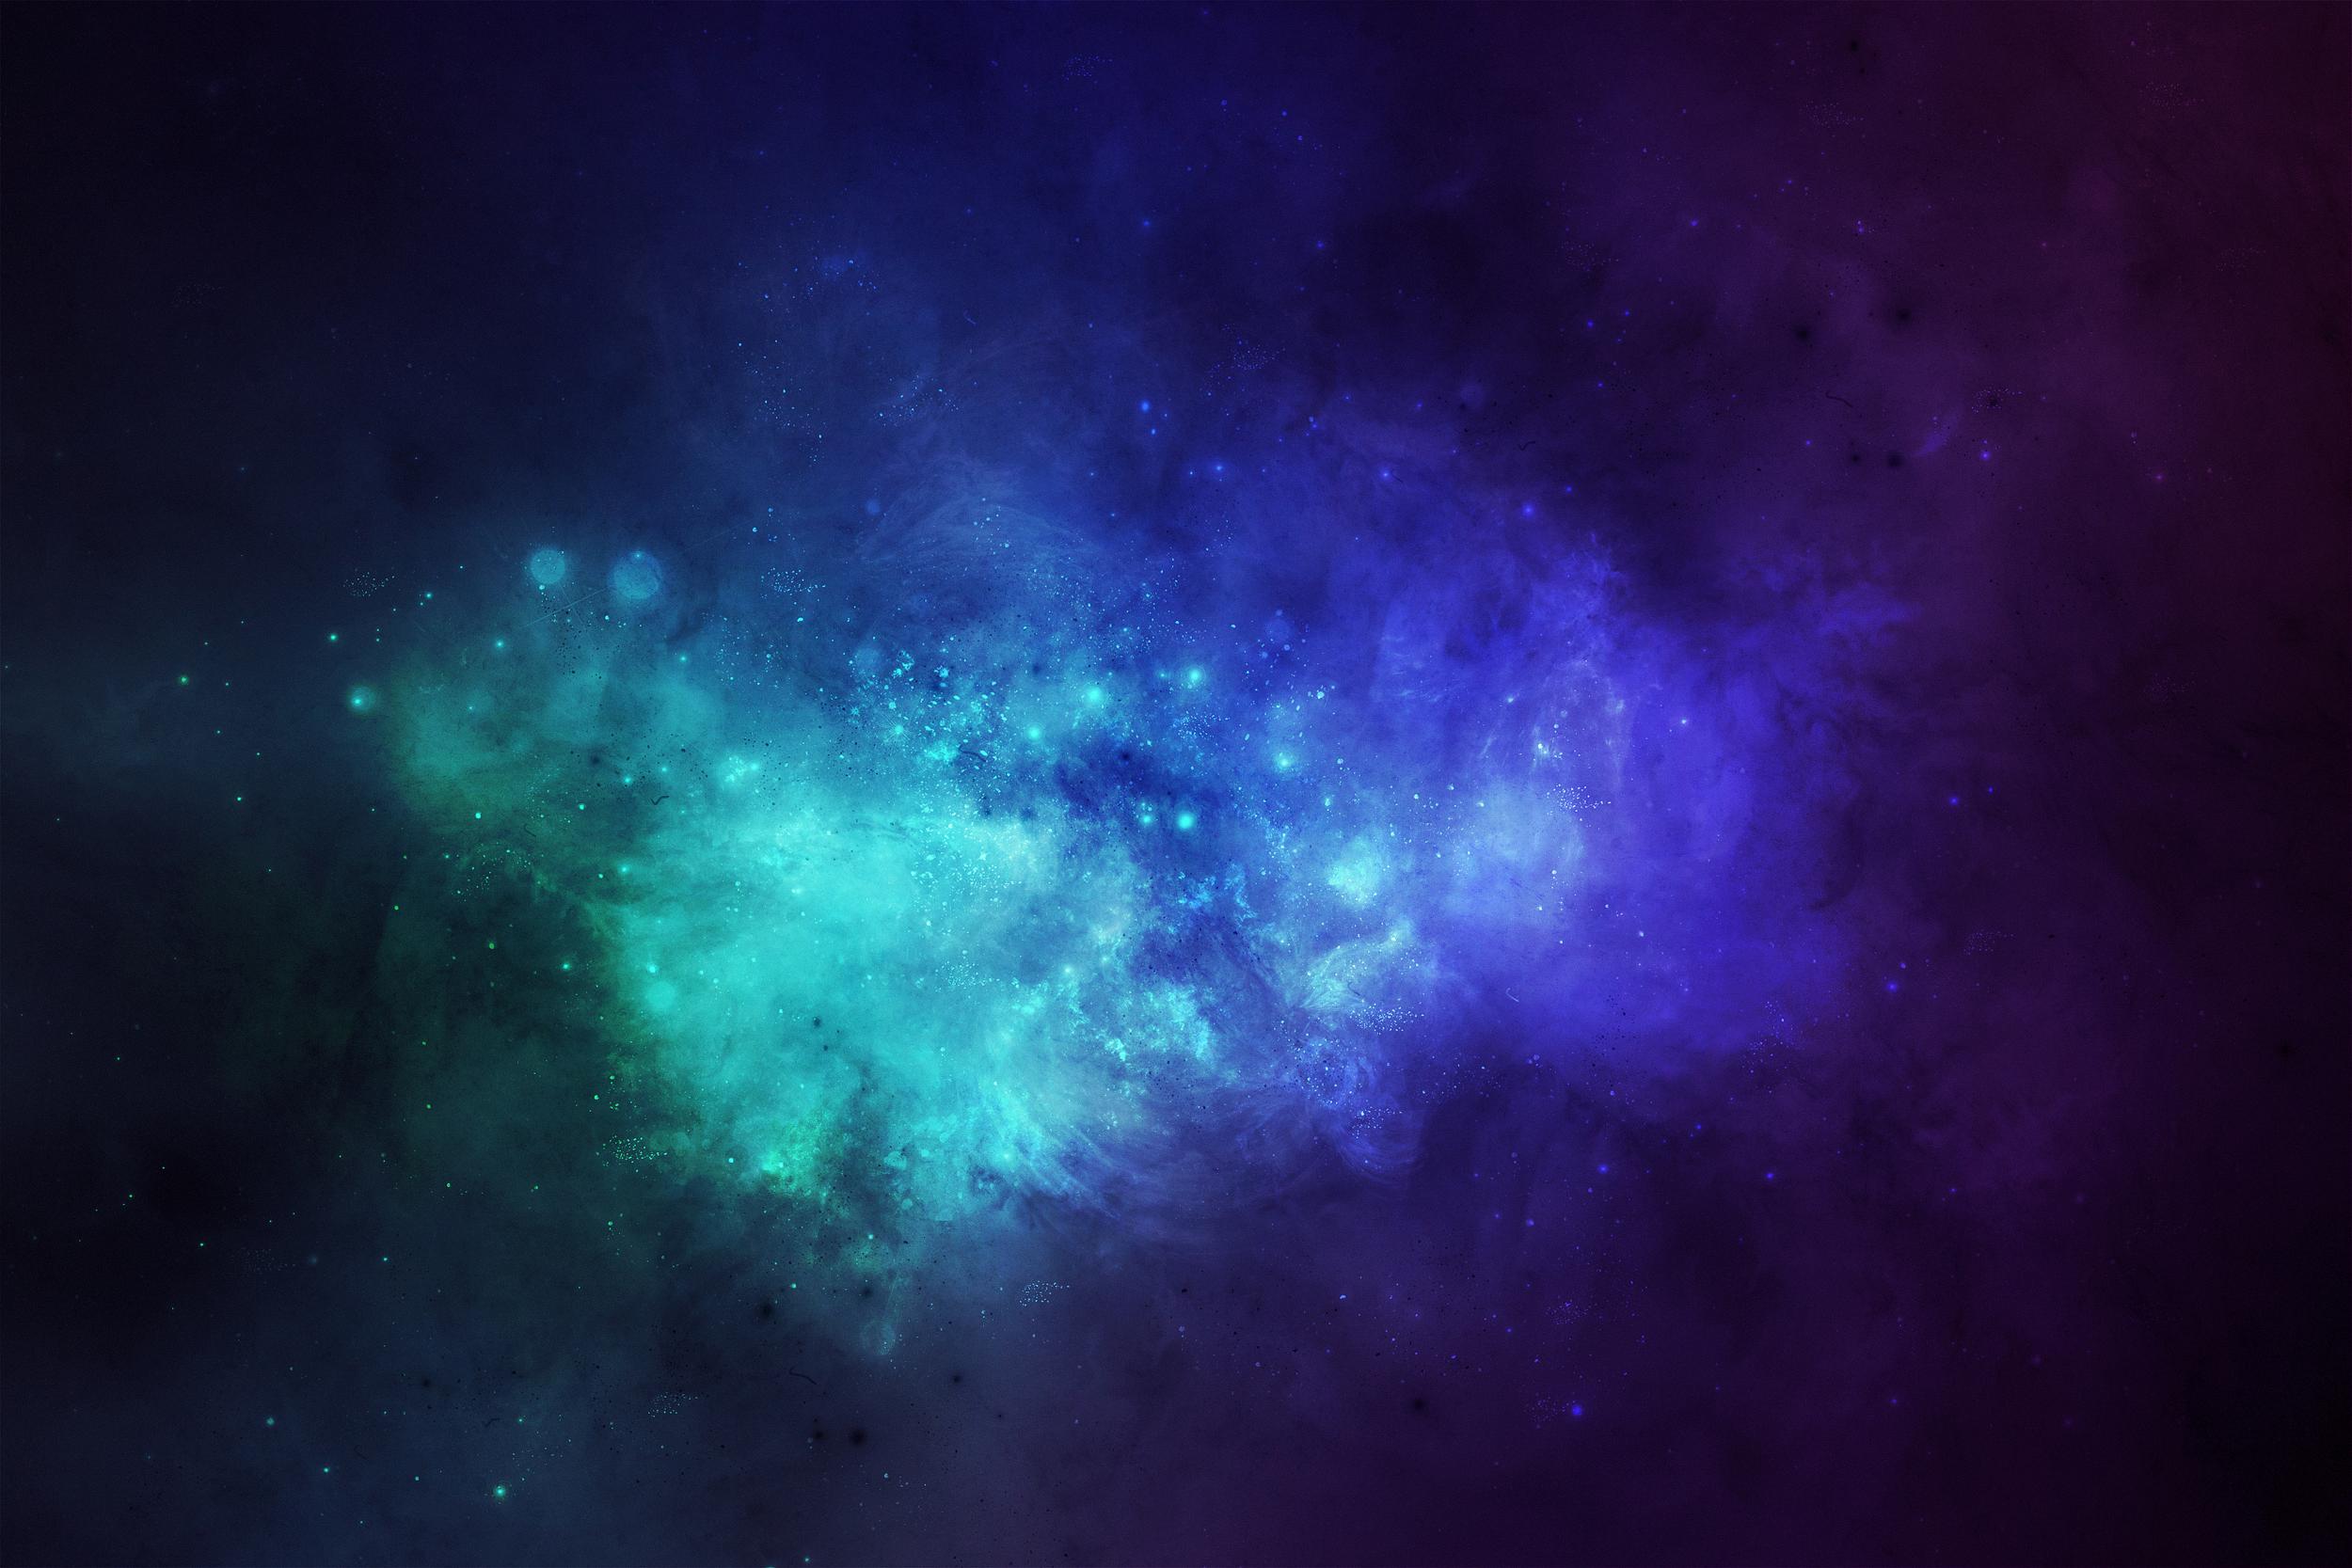 Space Background_AquaBlue.png